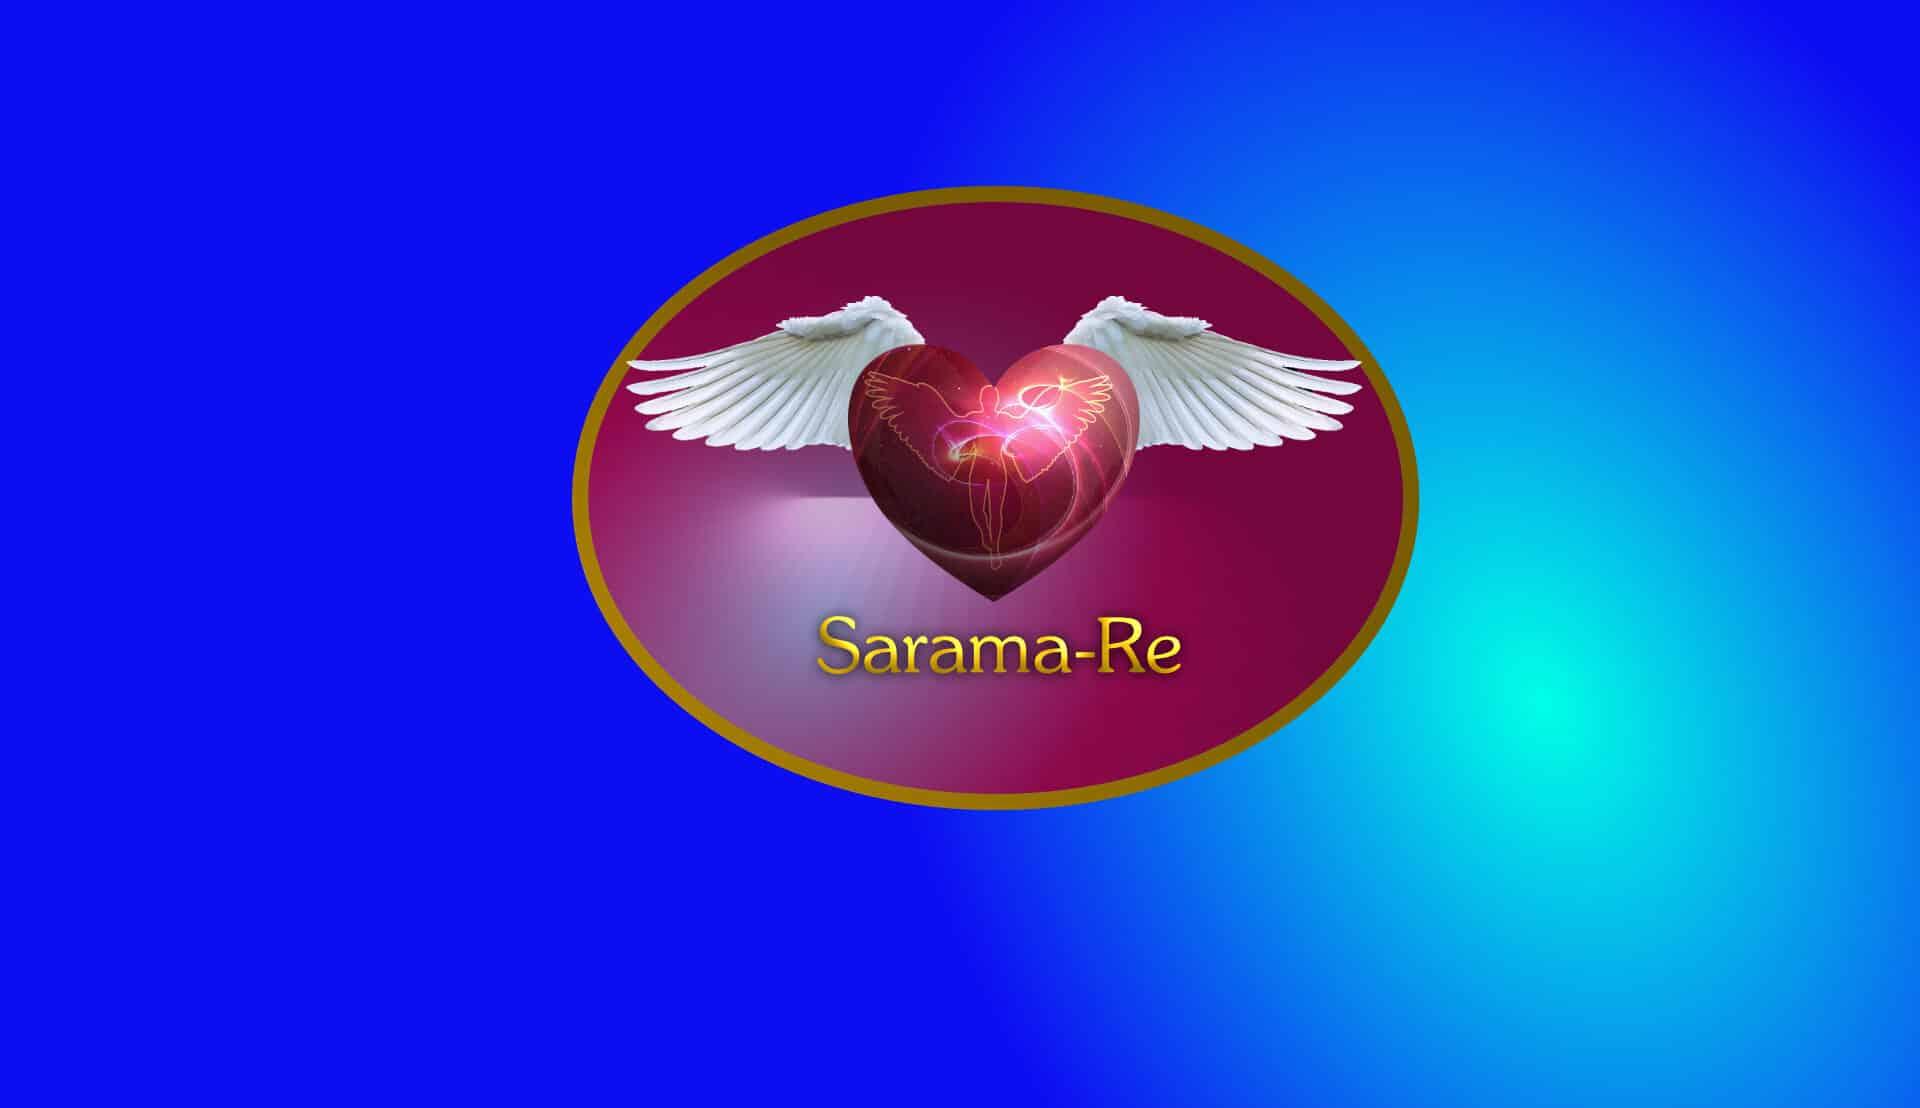 Sarama-Re